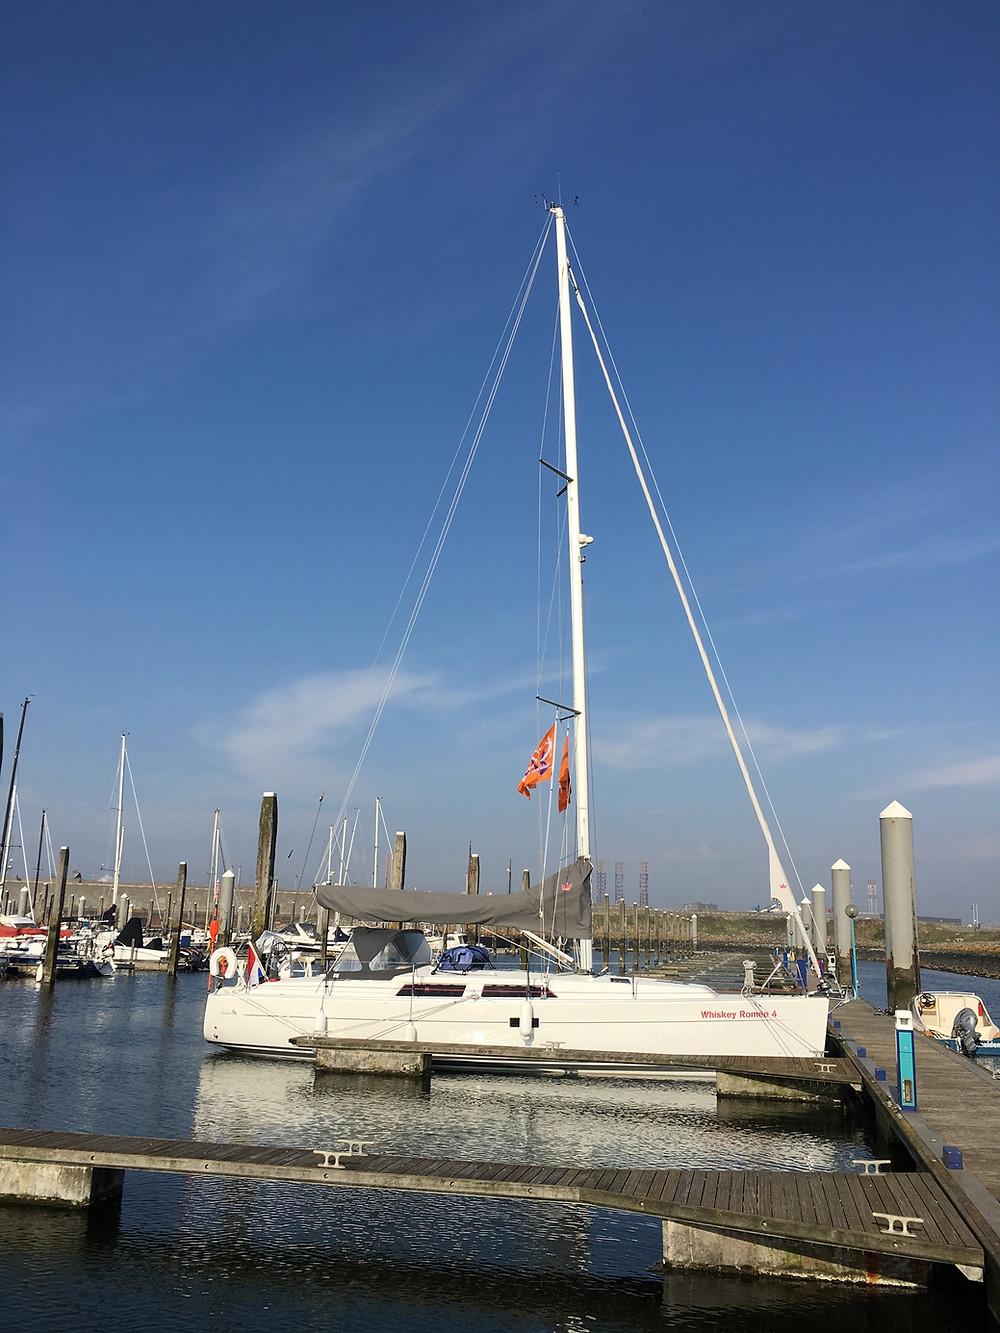 Seaport Marina in IJmuiden